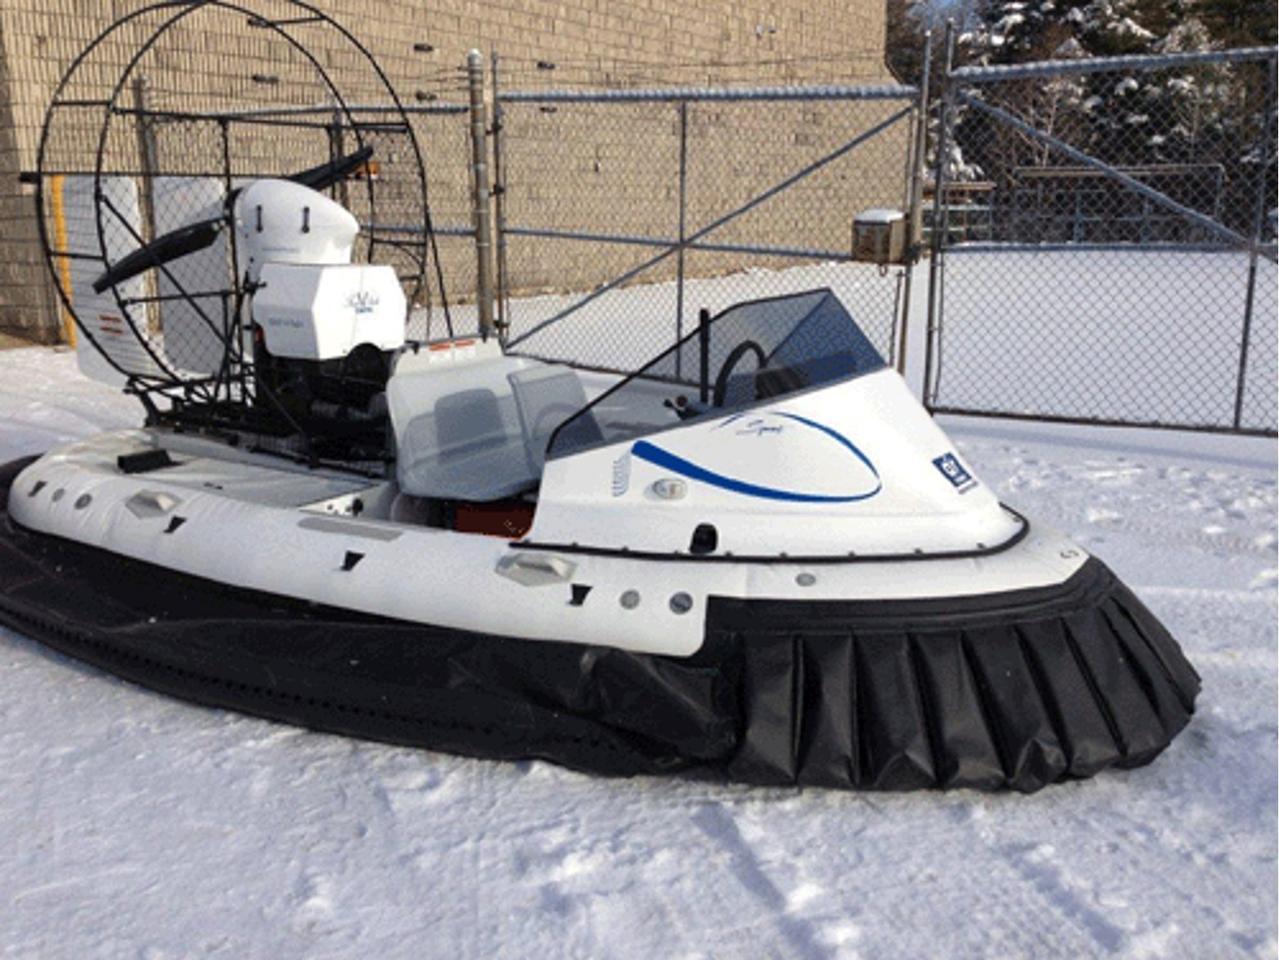 AirRider hovercraft showing hybrid skirt